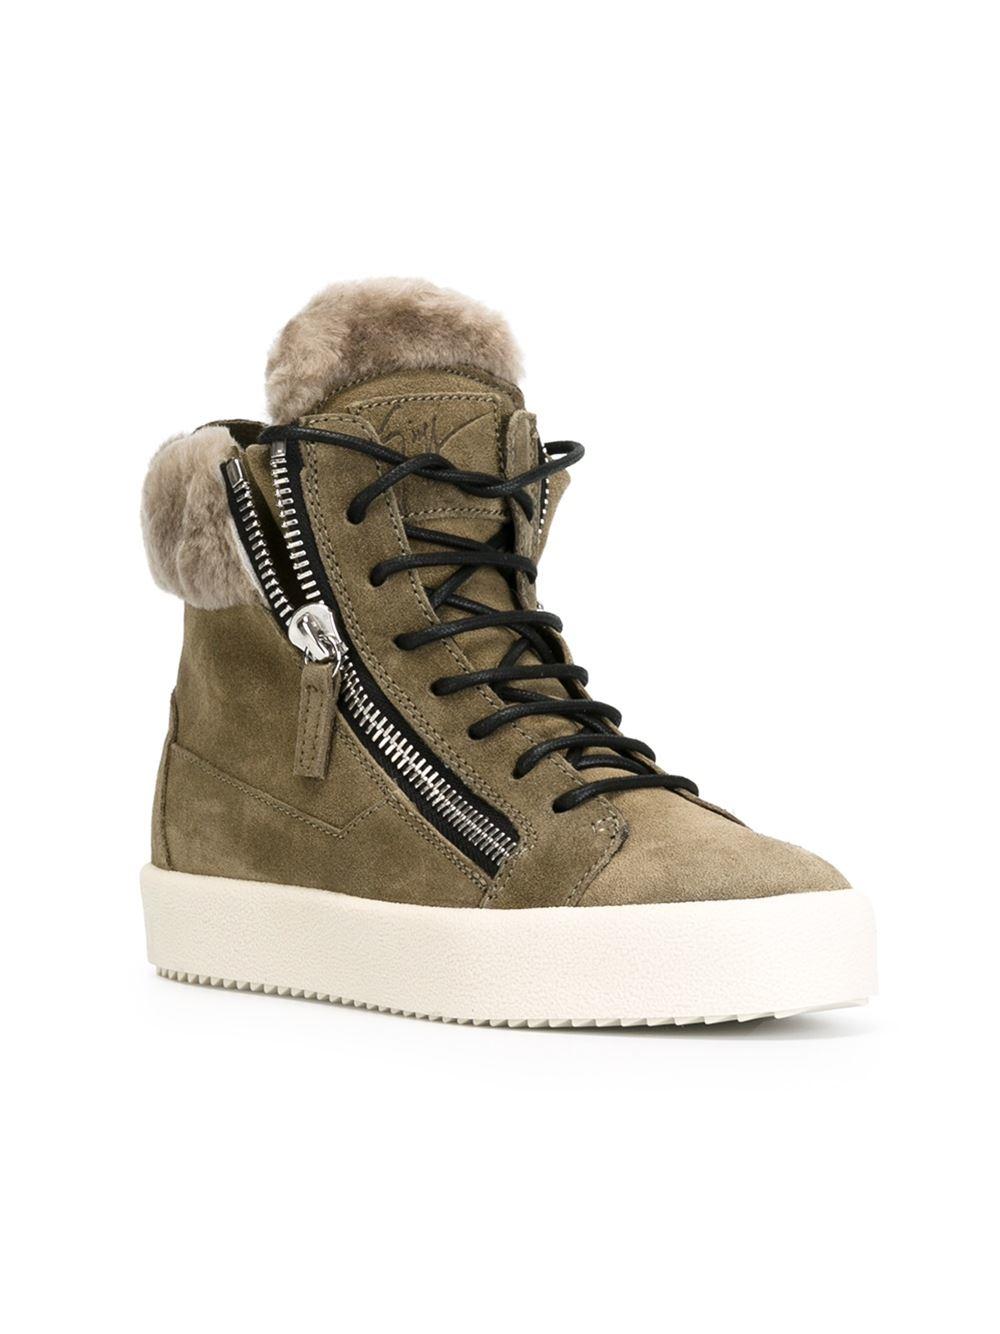 Giuseppe Zanotti Faux Fur Trim Hi Top Sneakers In Green